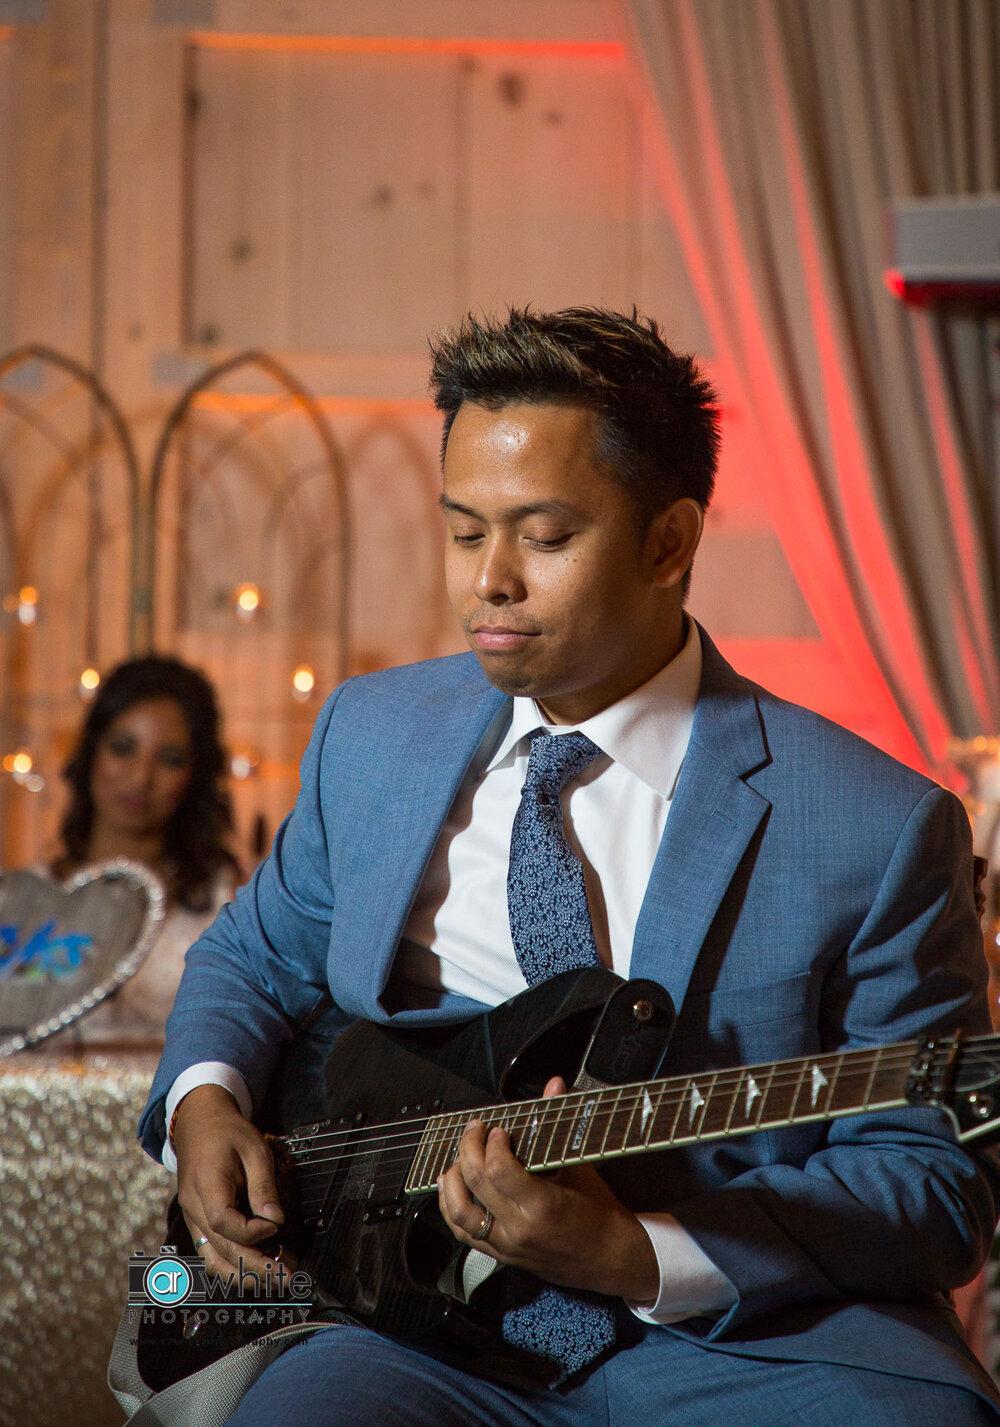 Groom's guitar performance at Kylan Barn wedding reception.